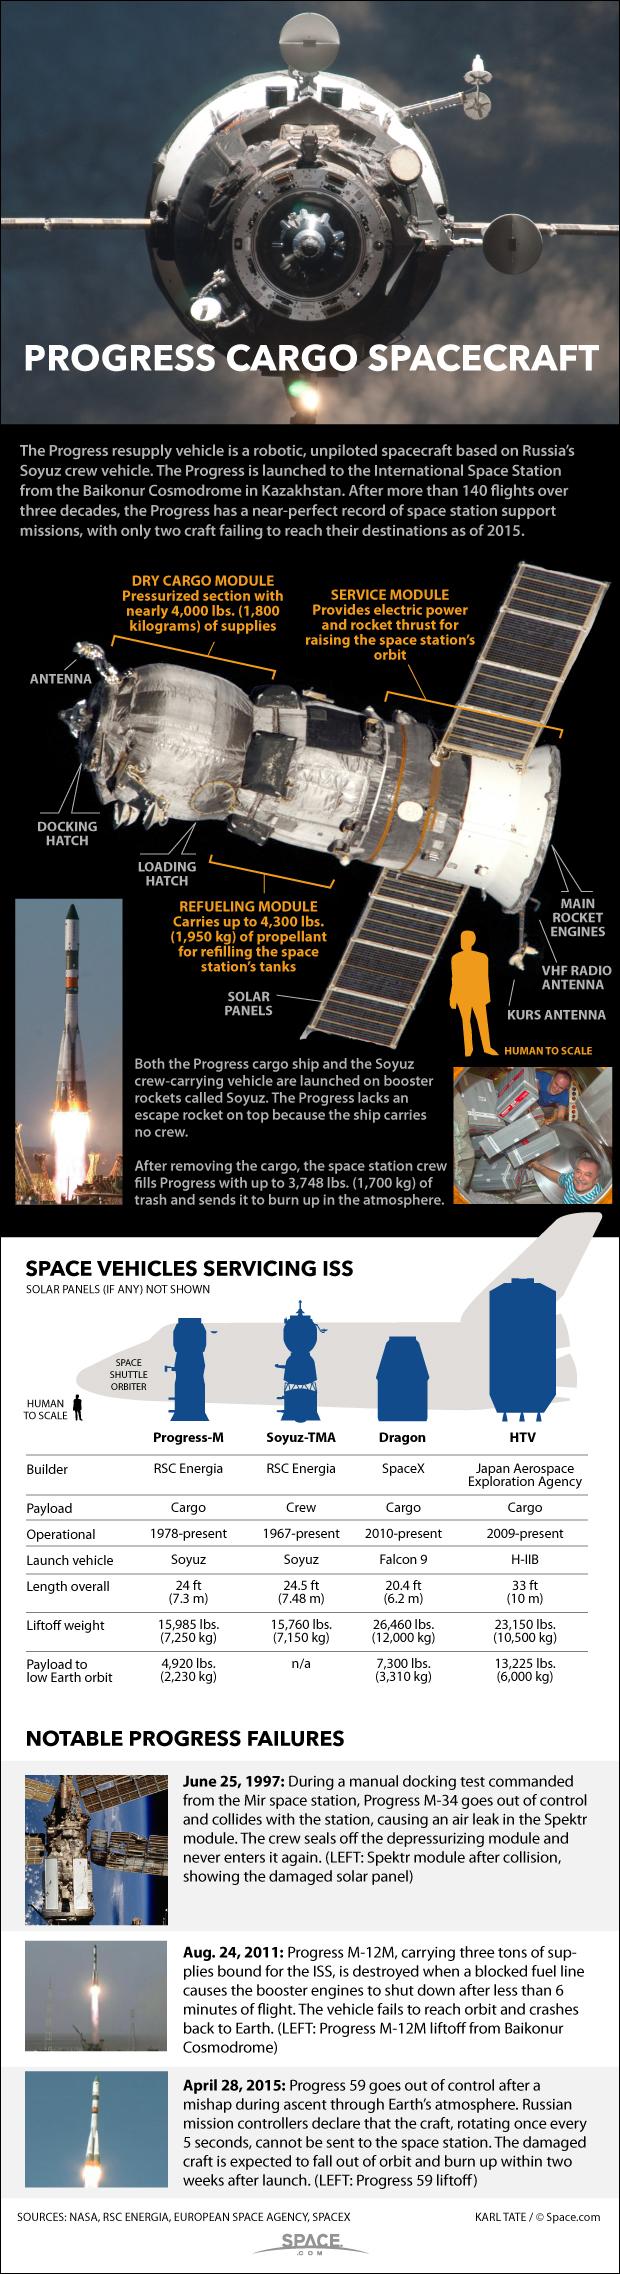 Russia's Progress Cargo Spacecraft